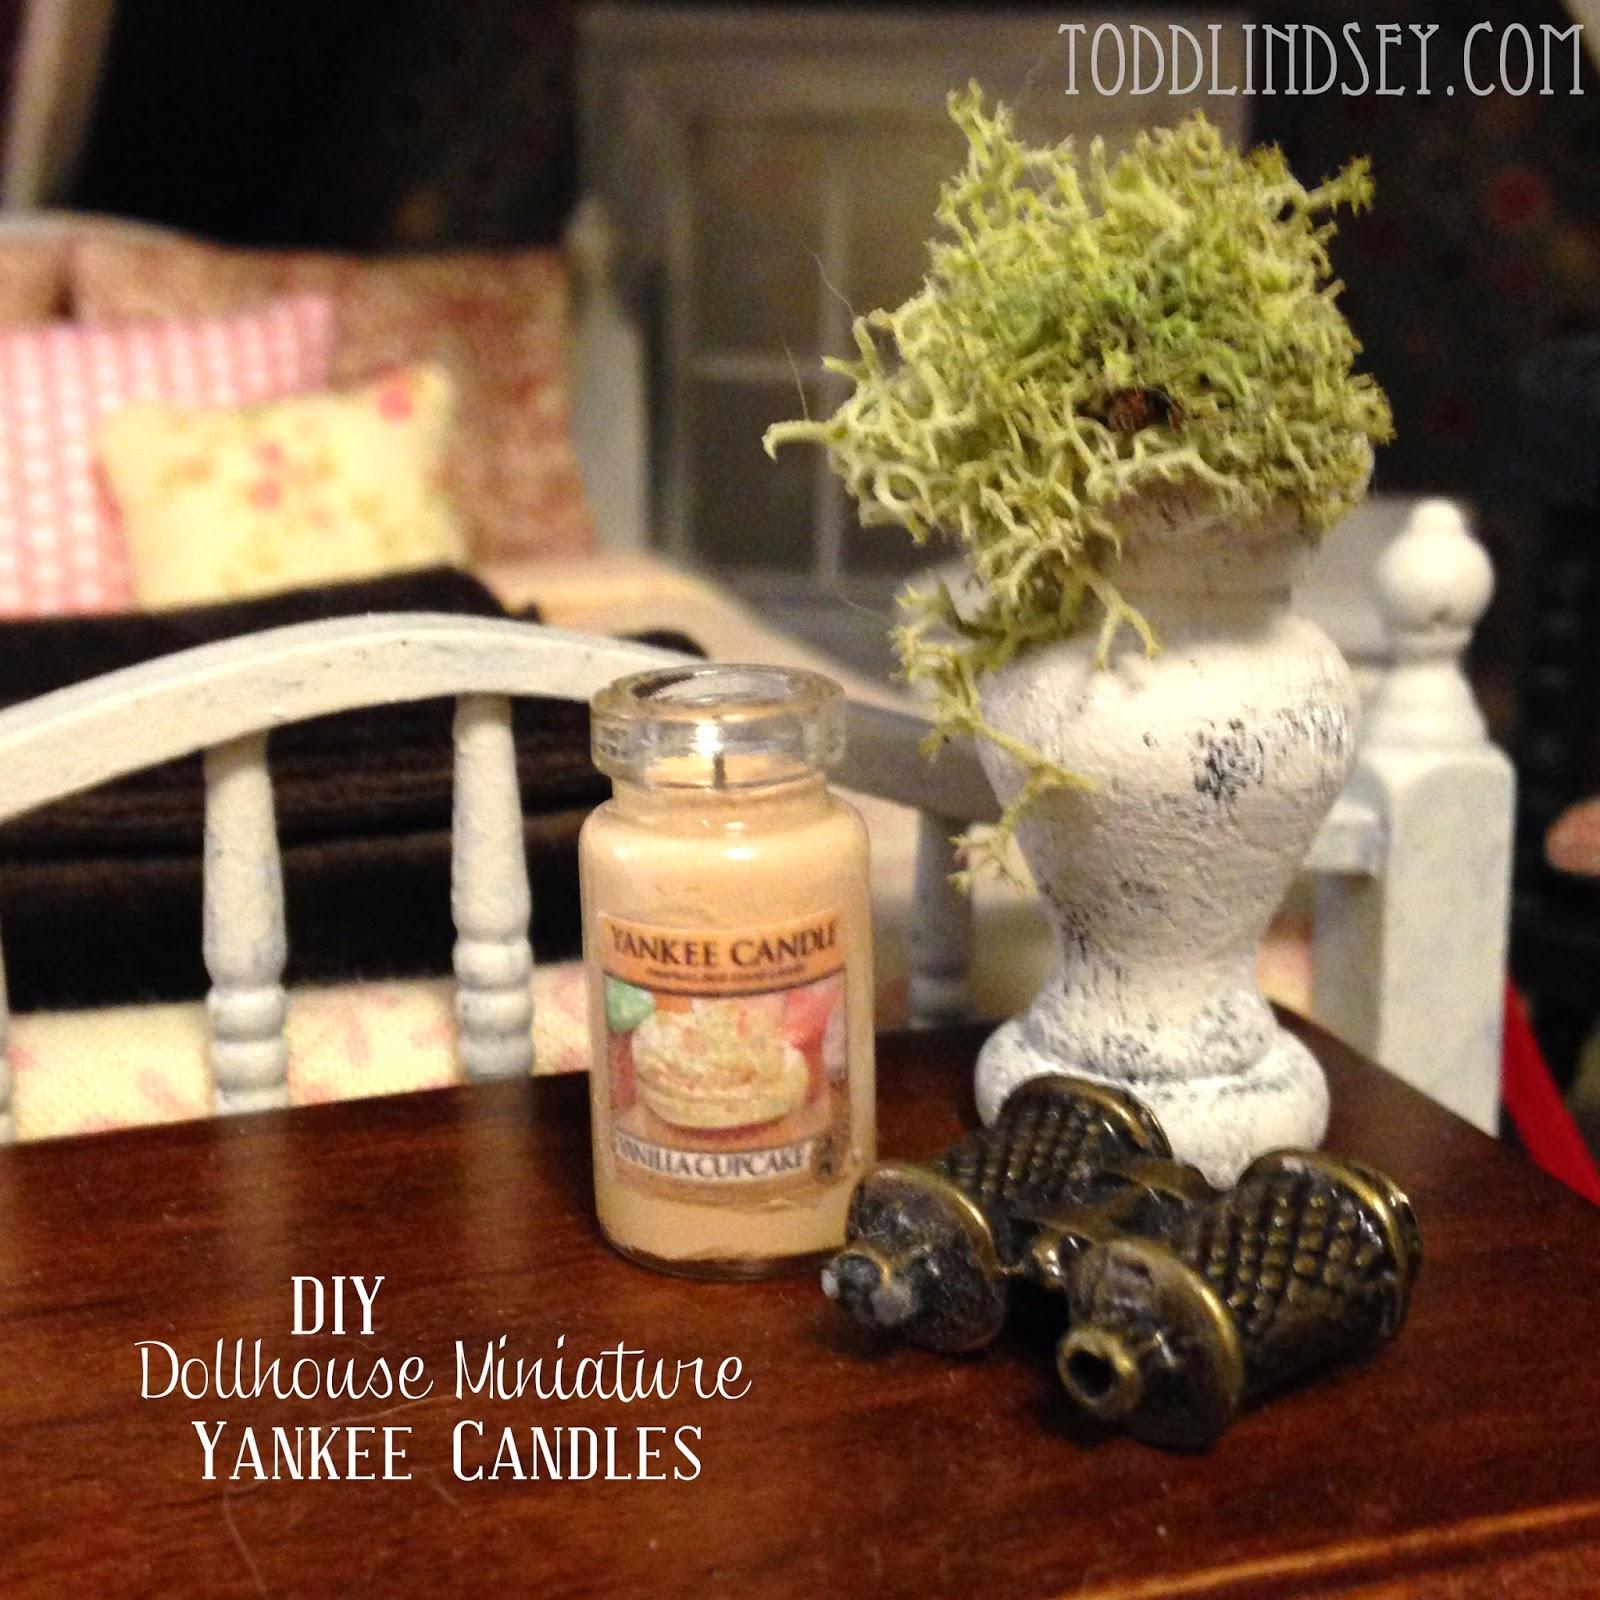 Dollhouse Miniatures Tutorials: Domer Home: DIY DOLLHOUSE MINIATURE YANKEE CANDLES